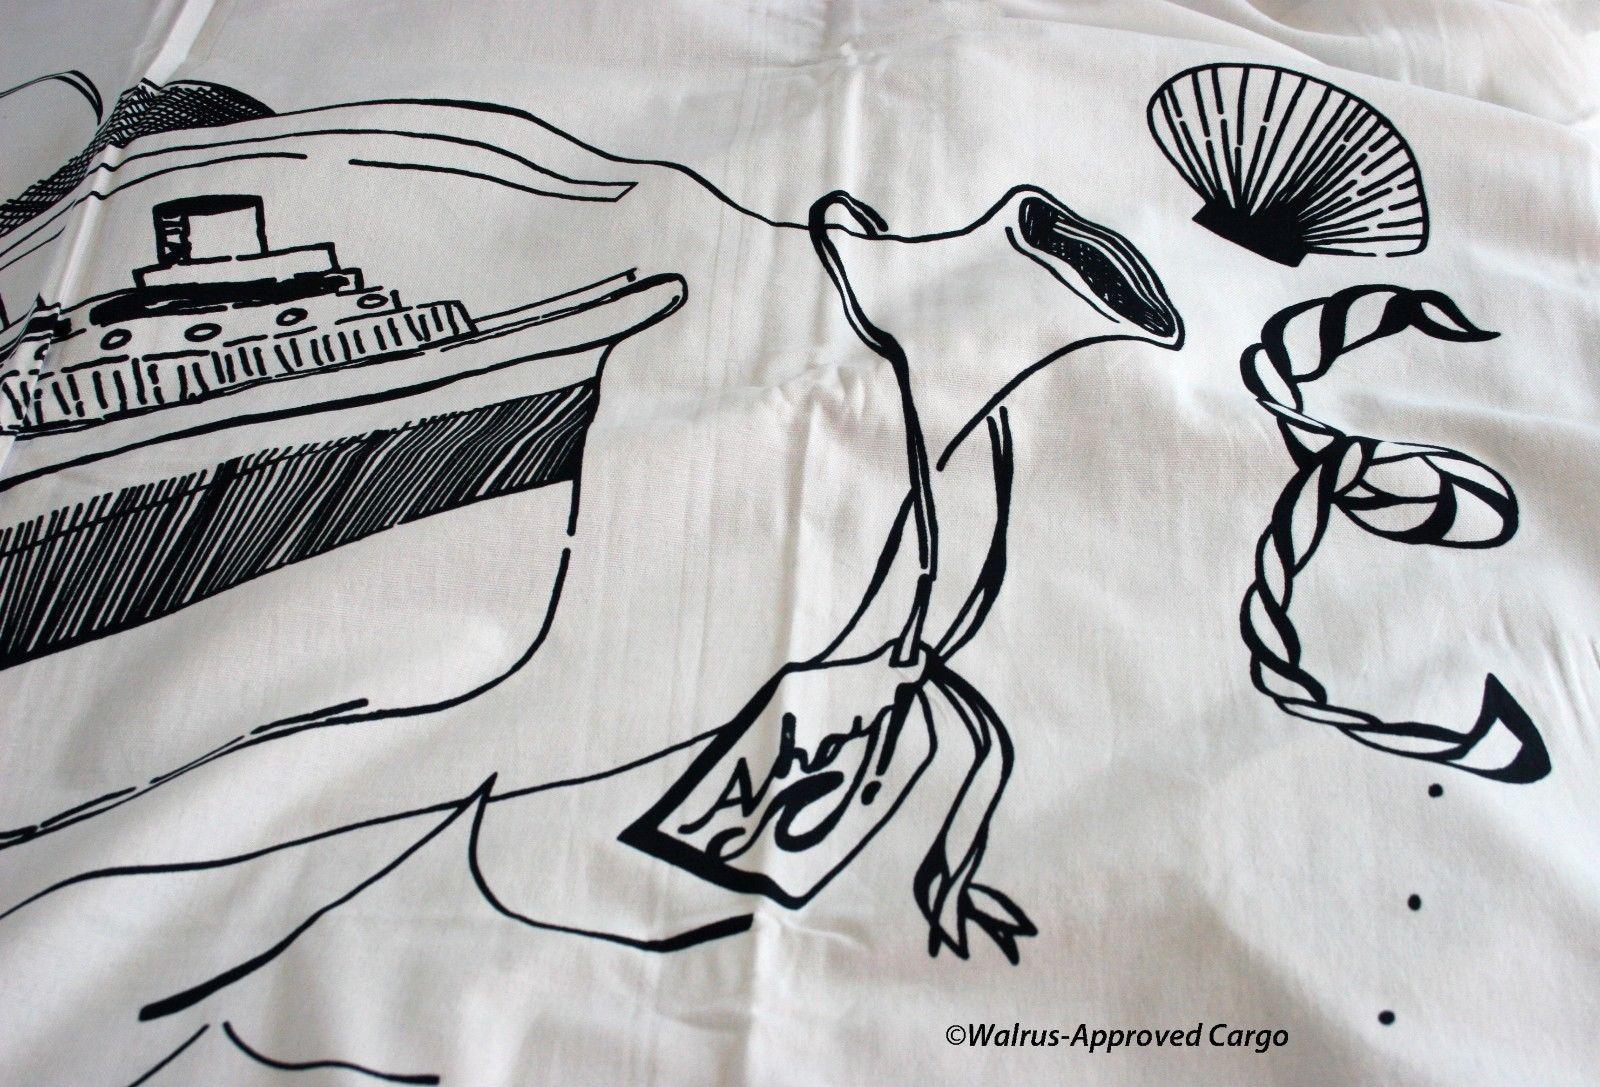 CRATE & BARREL KIDS SHIP IN A BOTTLE SHOWER CURTAIN -NWT- SAIL INTO FUN DÉCOR!